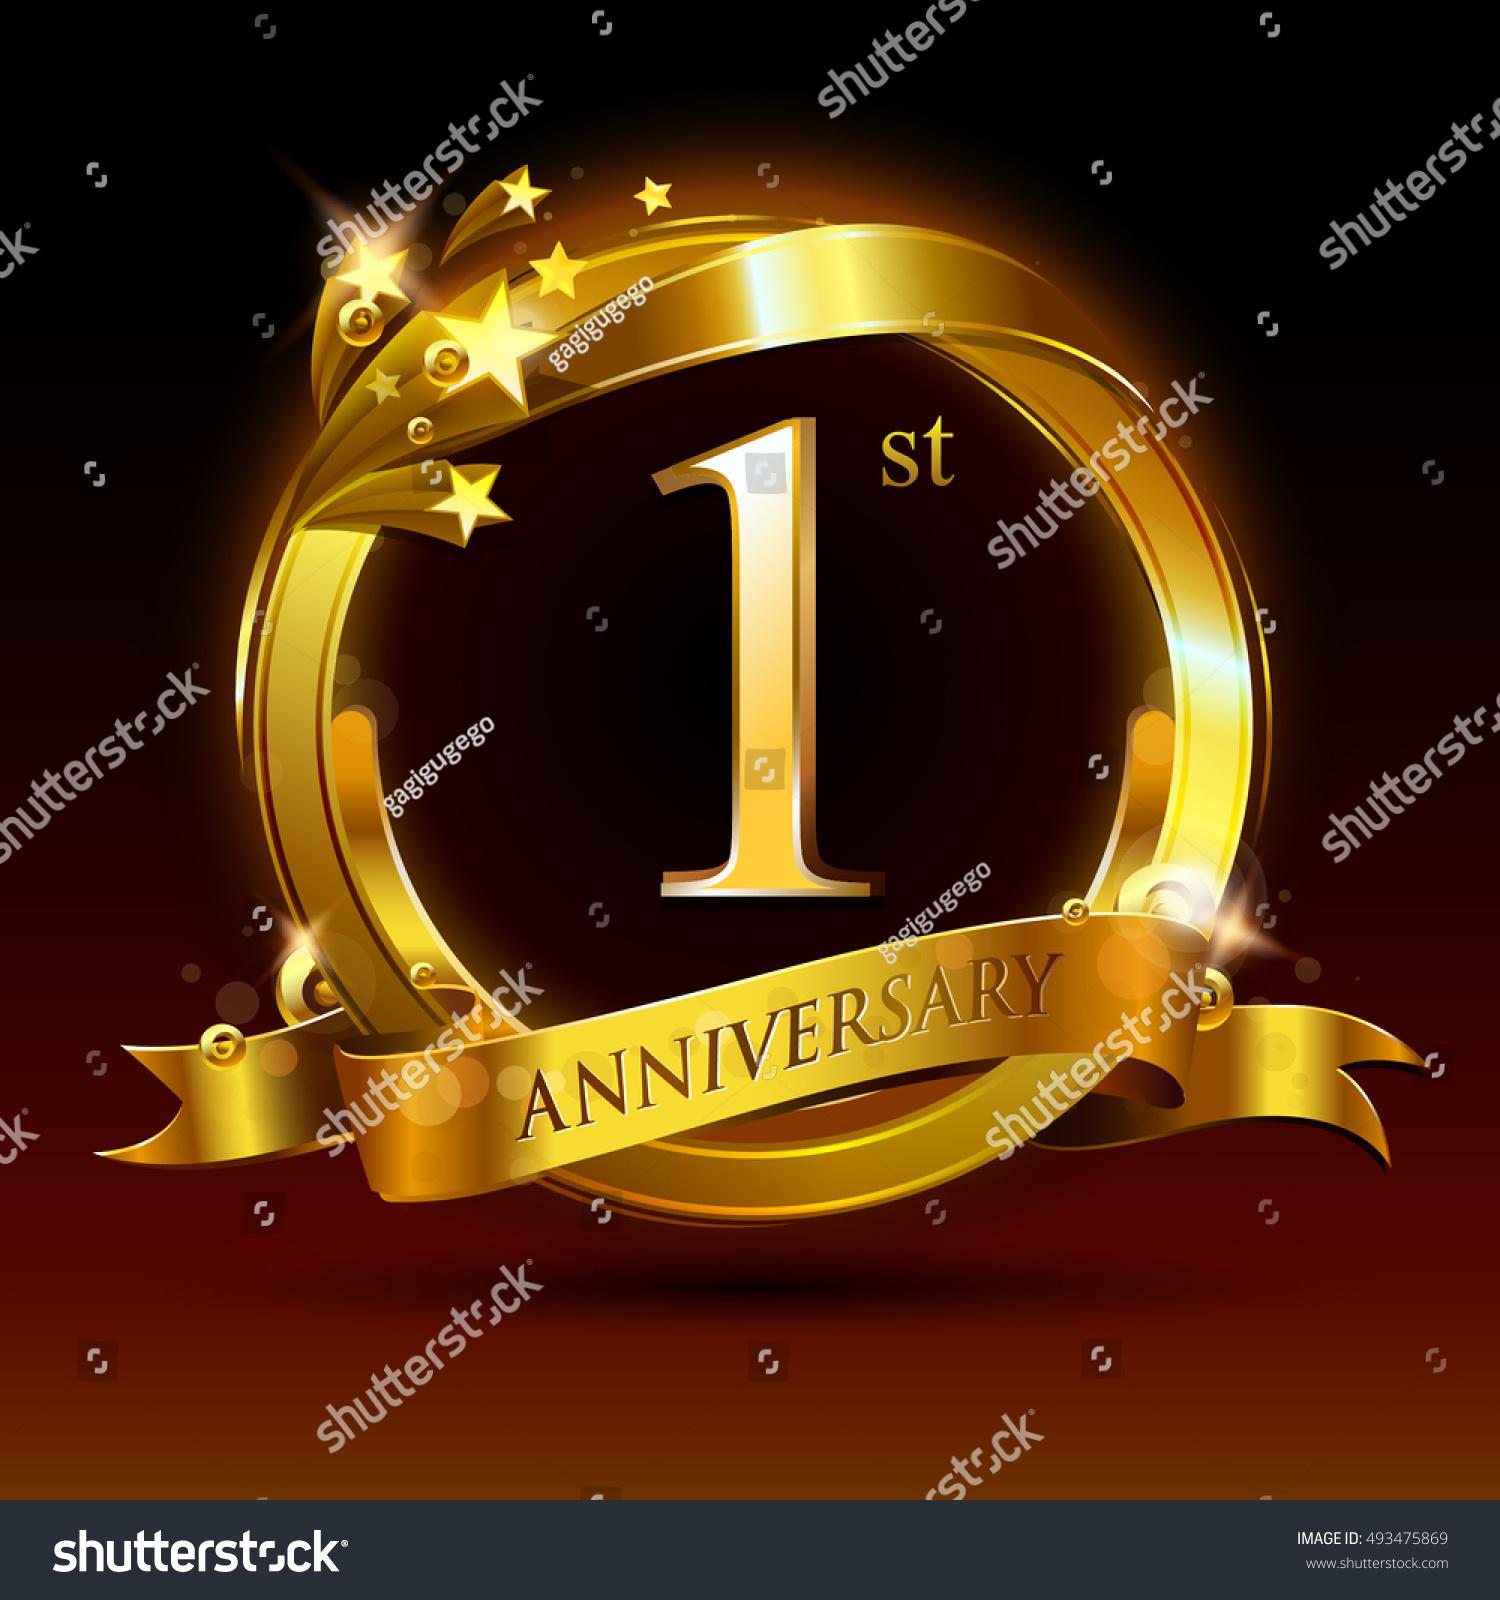 St golden anniversary logo year stock vector